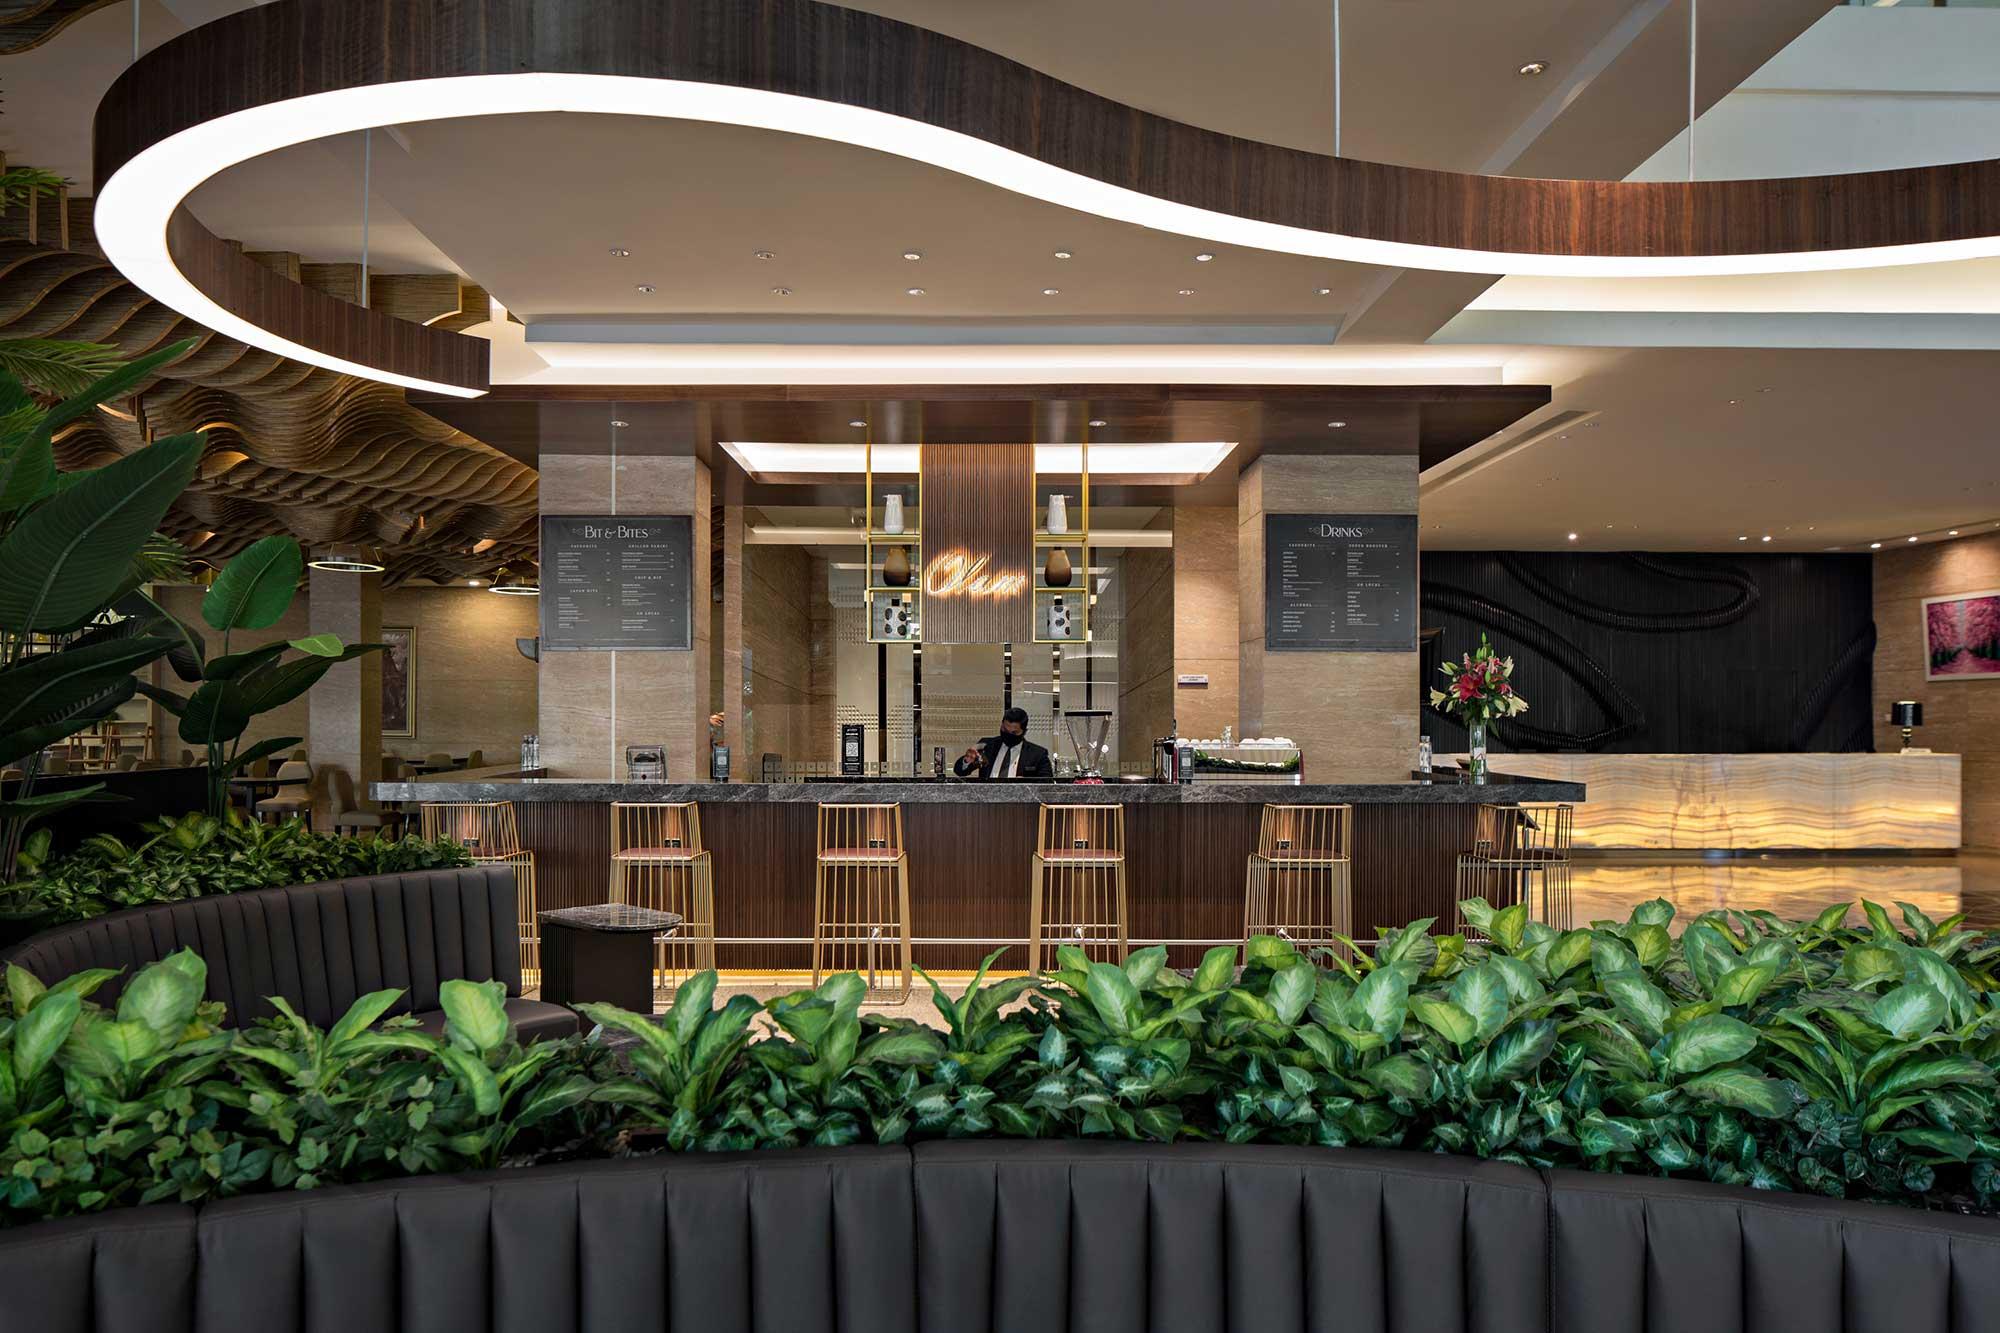 The renovated reception area of JS Luwansa's hotel. Design + Build by AVIP.